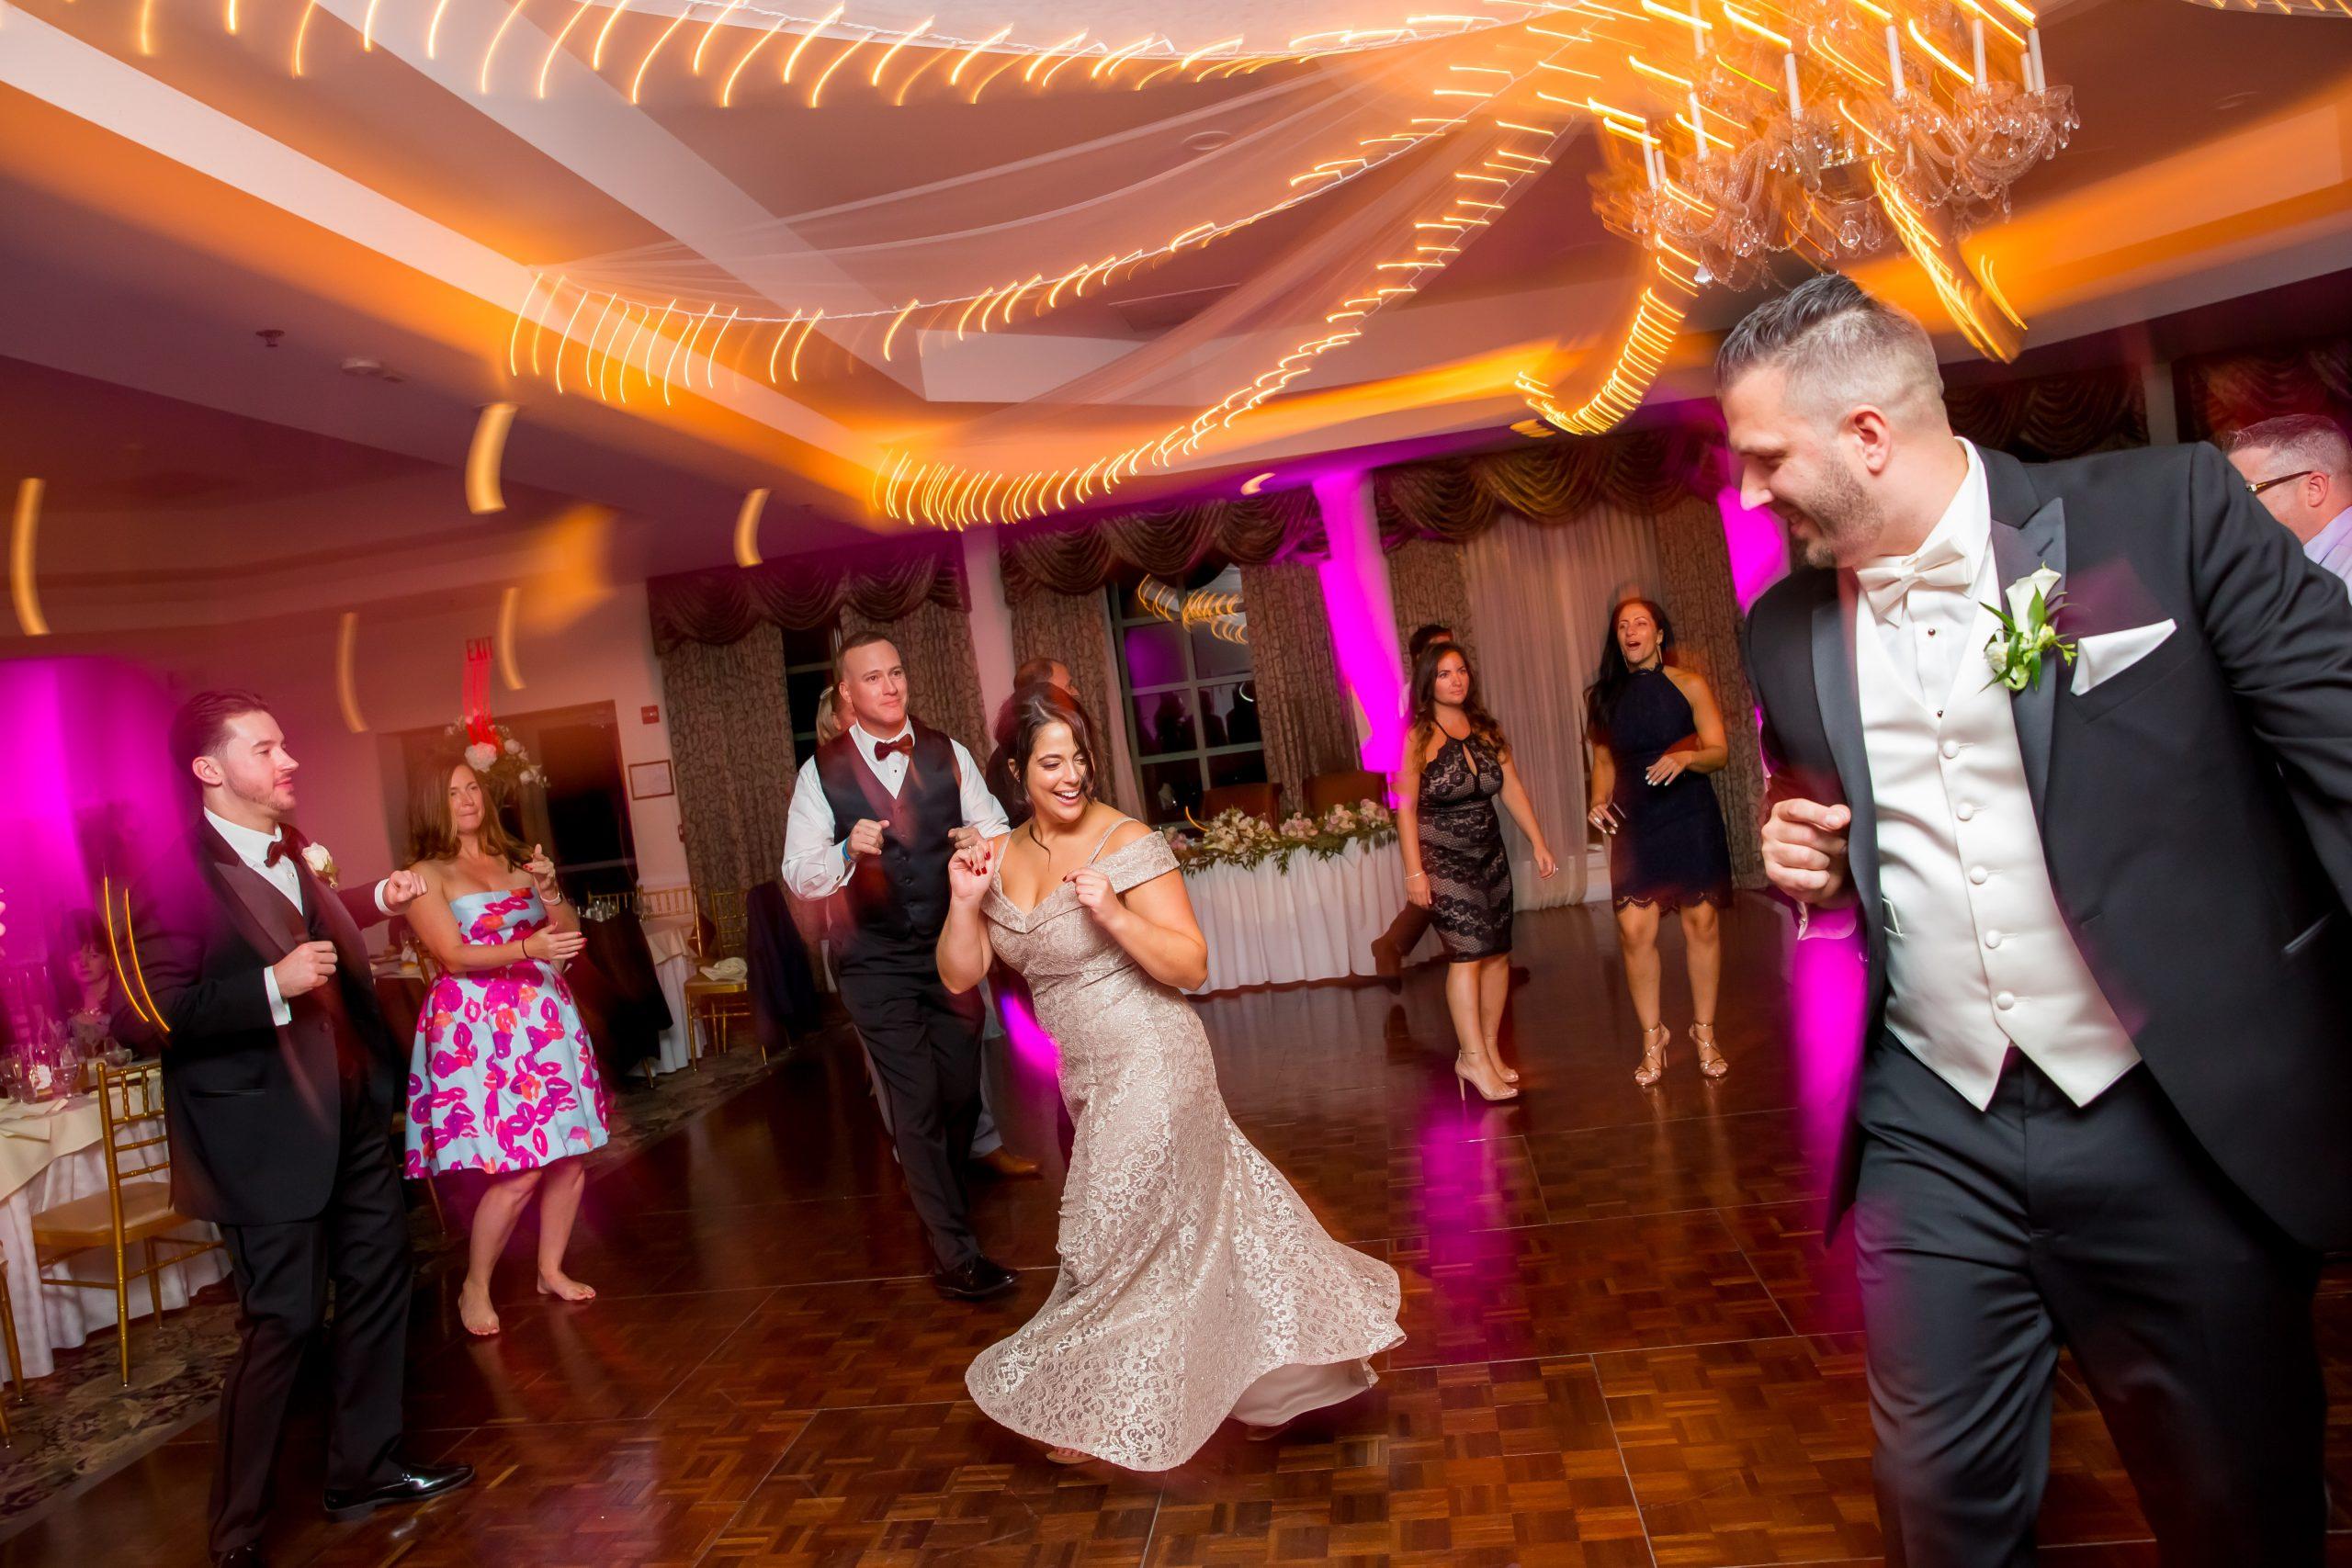 Victori_Rob_Mohawk River Country Club Wedding-61.jpg